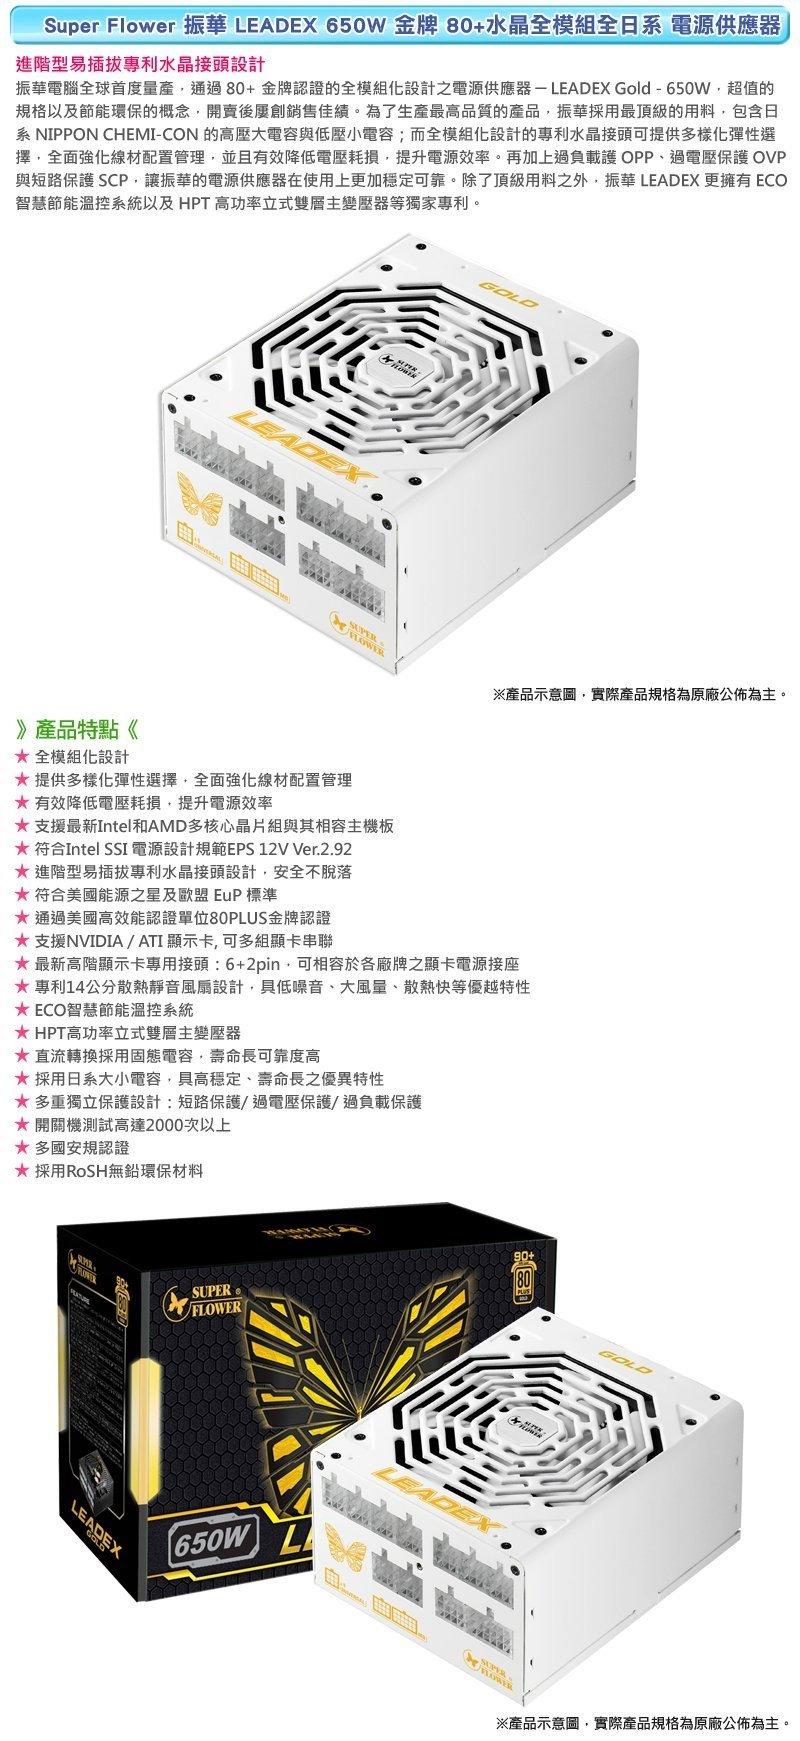 Super Flower 振華 LEADEX 650W 金牌 全模組 電源供應器(5年保) AUTOBUY購物中心